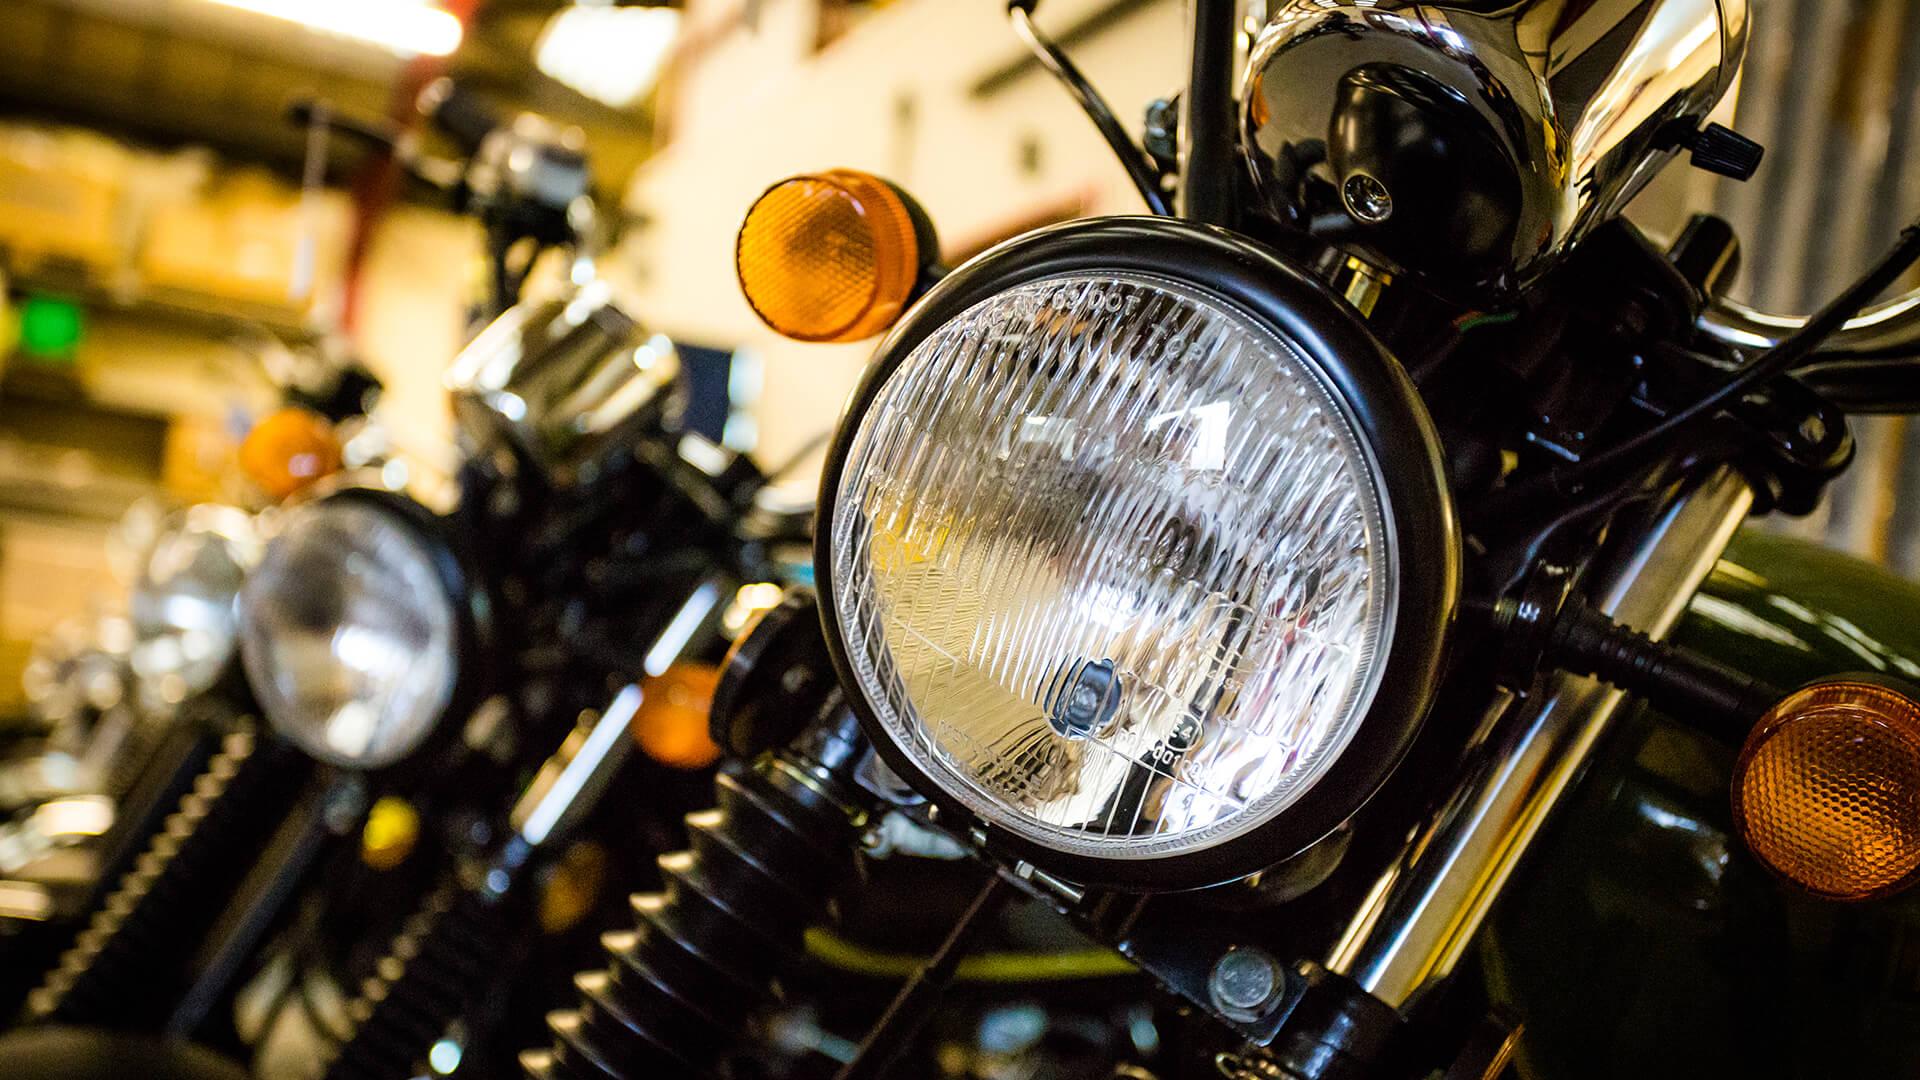 Herald motorcycle light